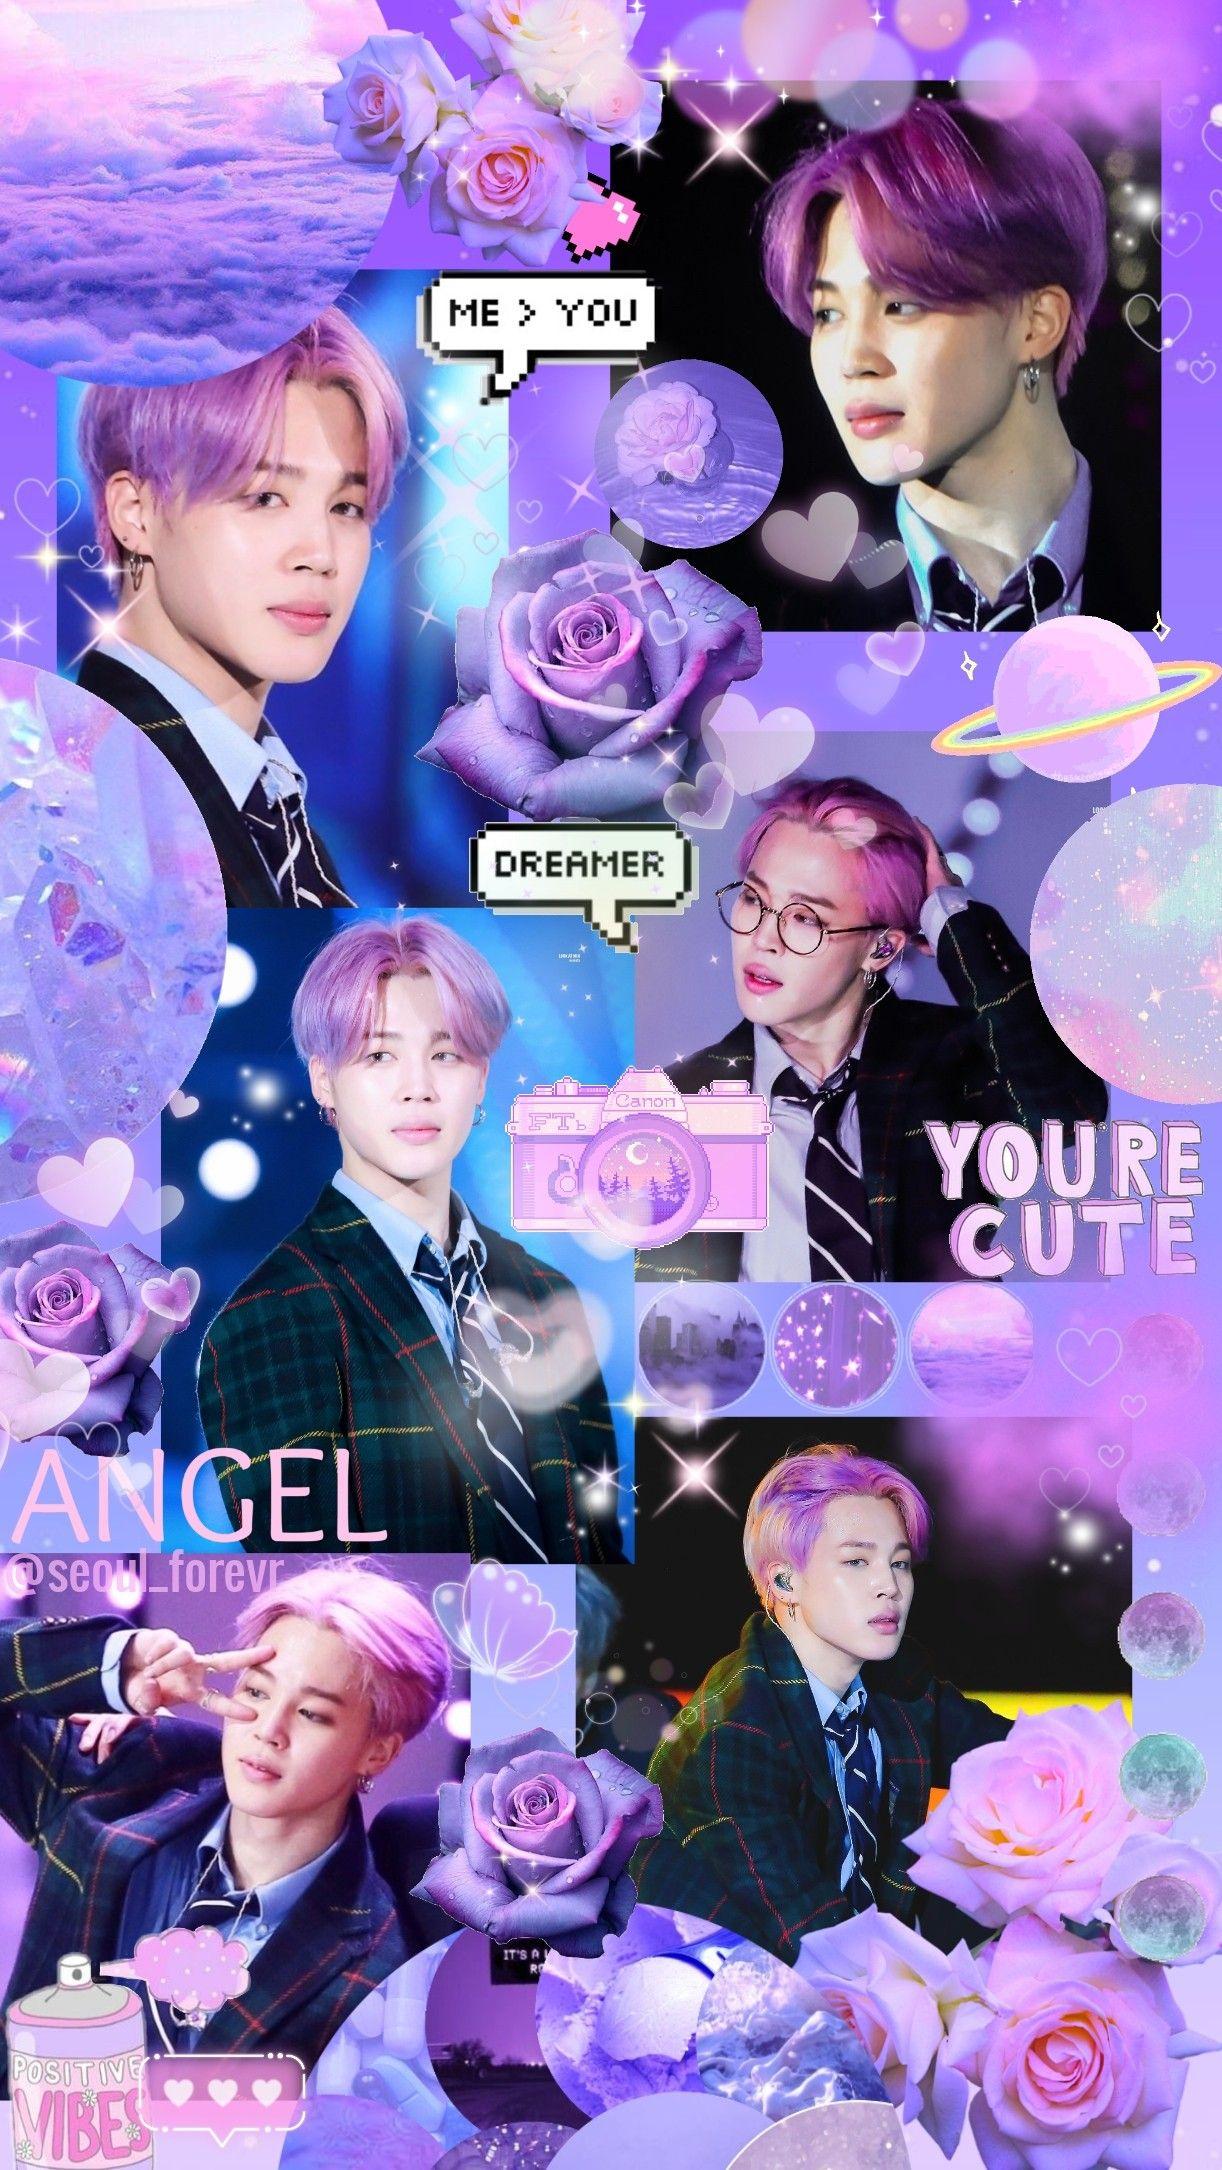 Bts Kpop Jimin Purple Wallpaper Gambar Fotografi Wallpaper Ponsel